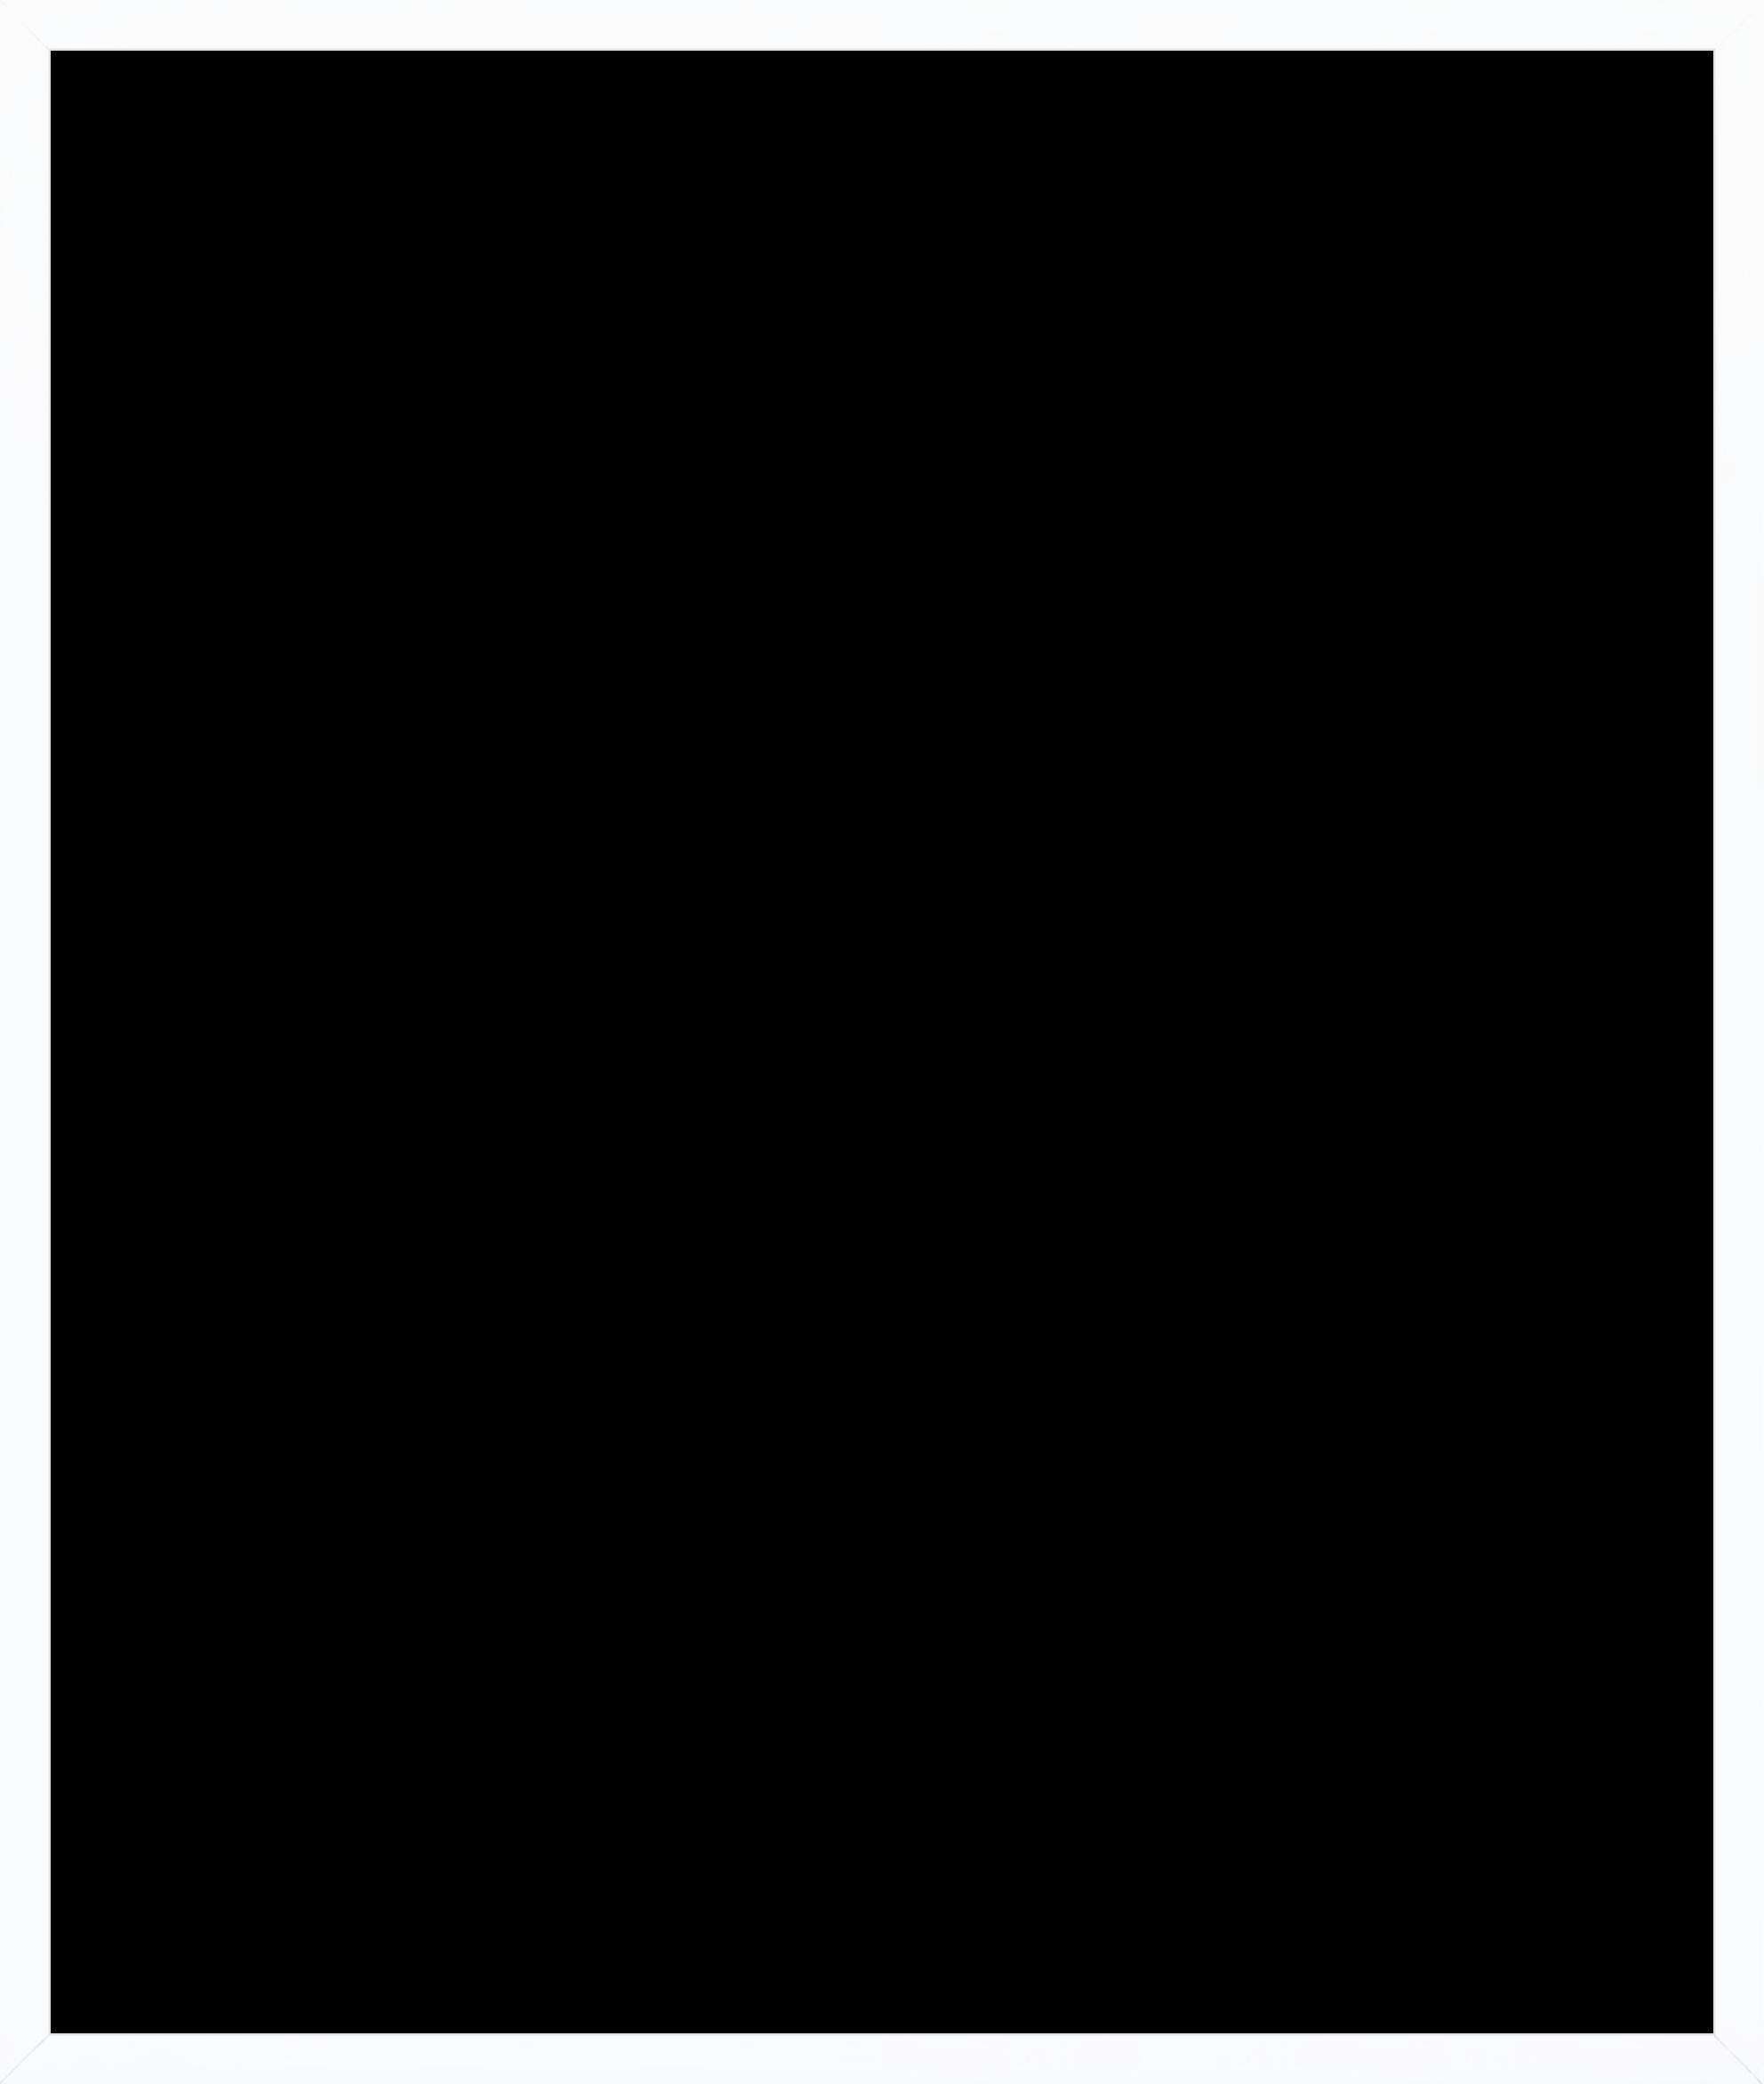 837-1426661707